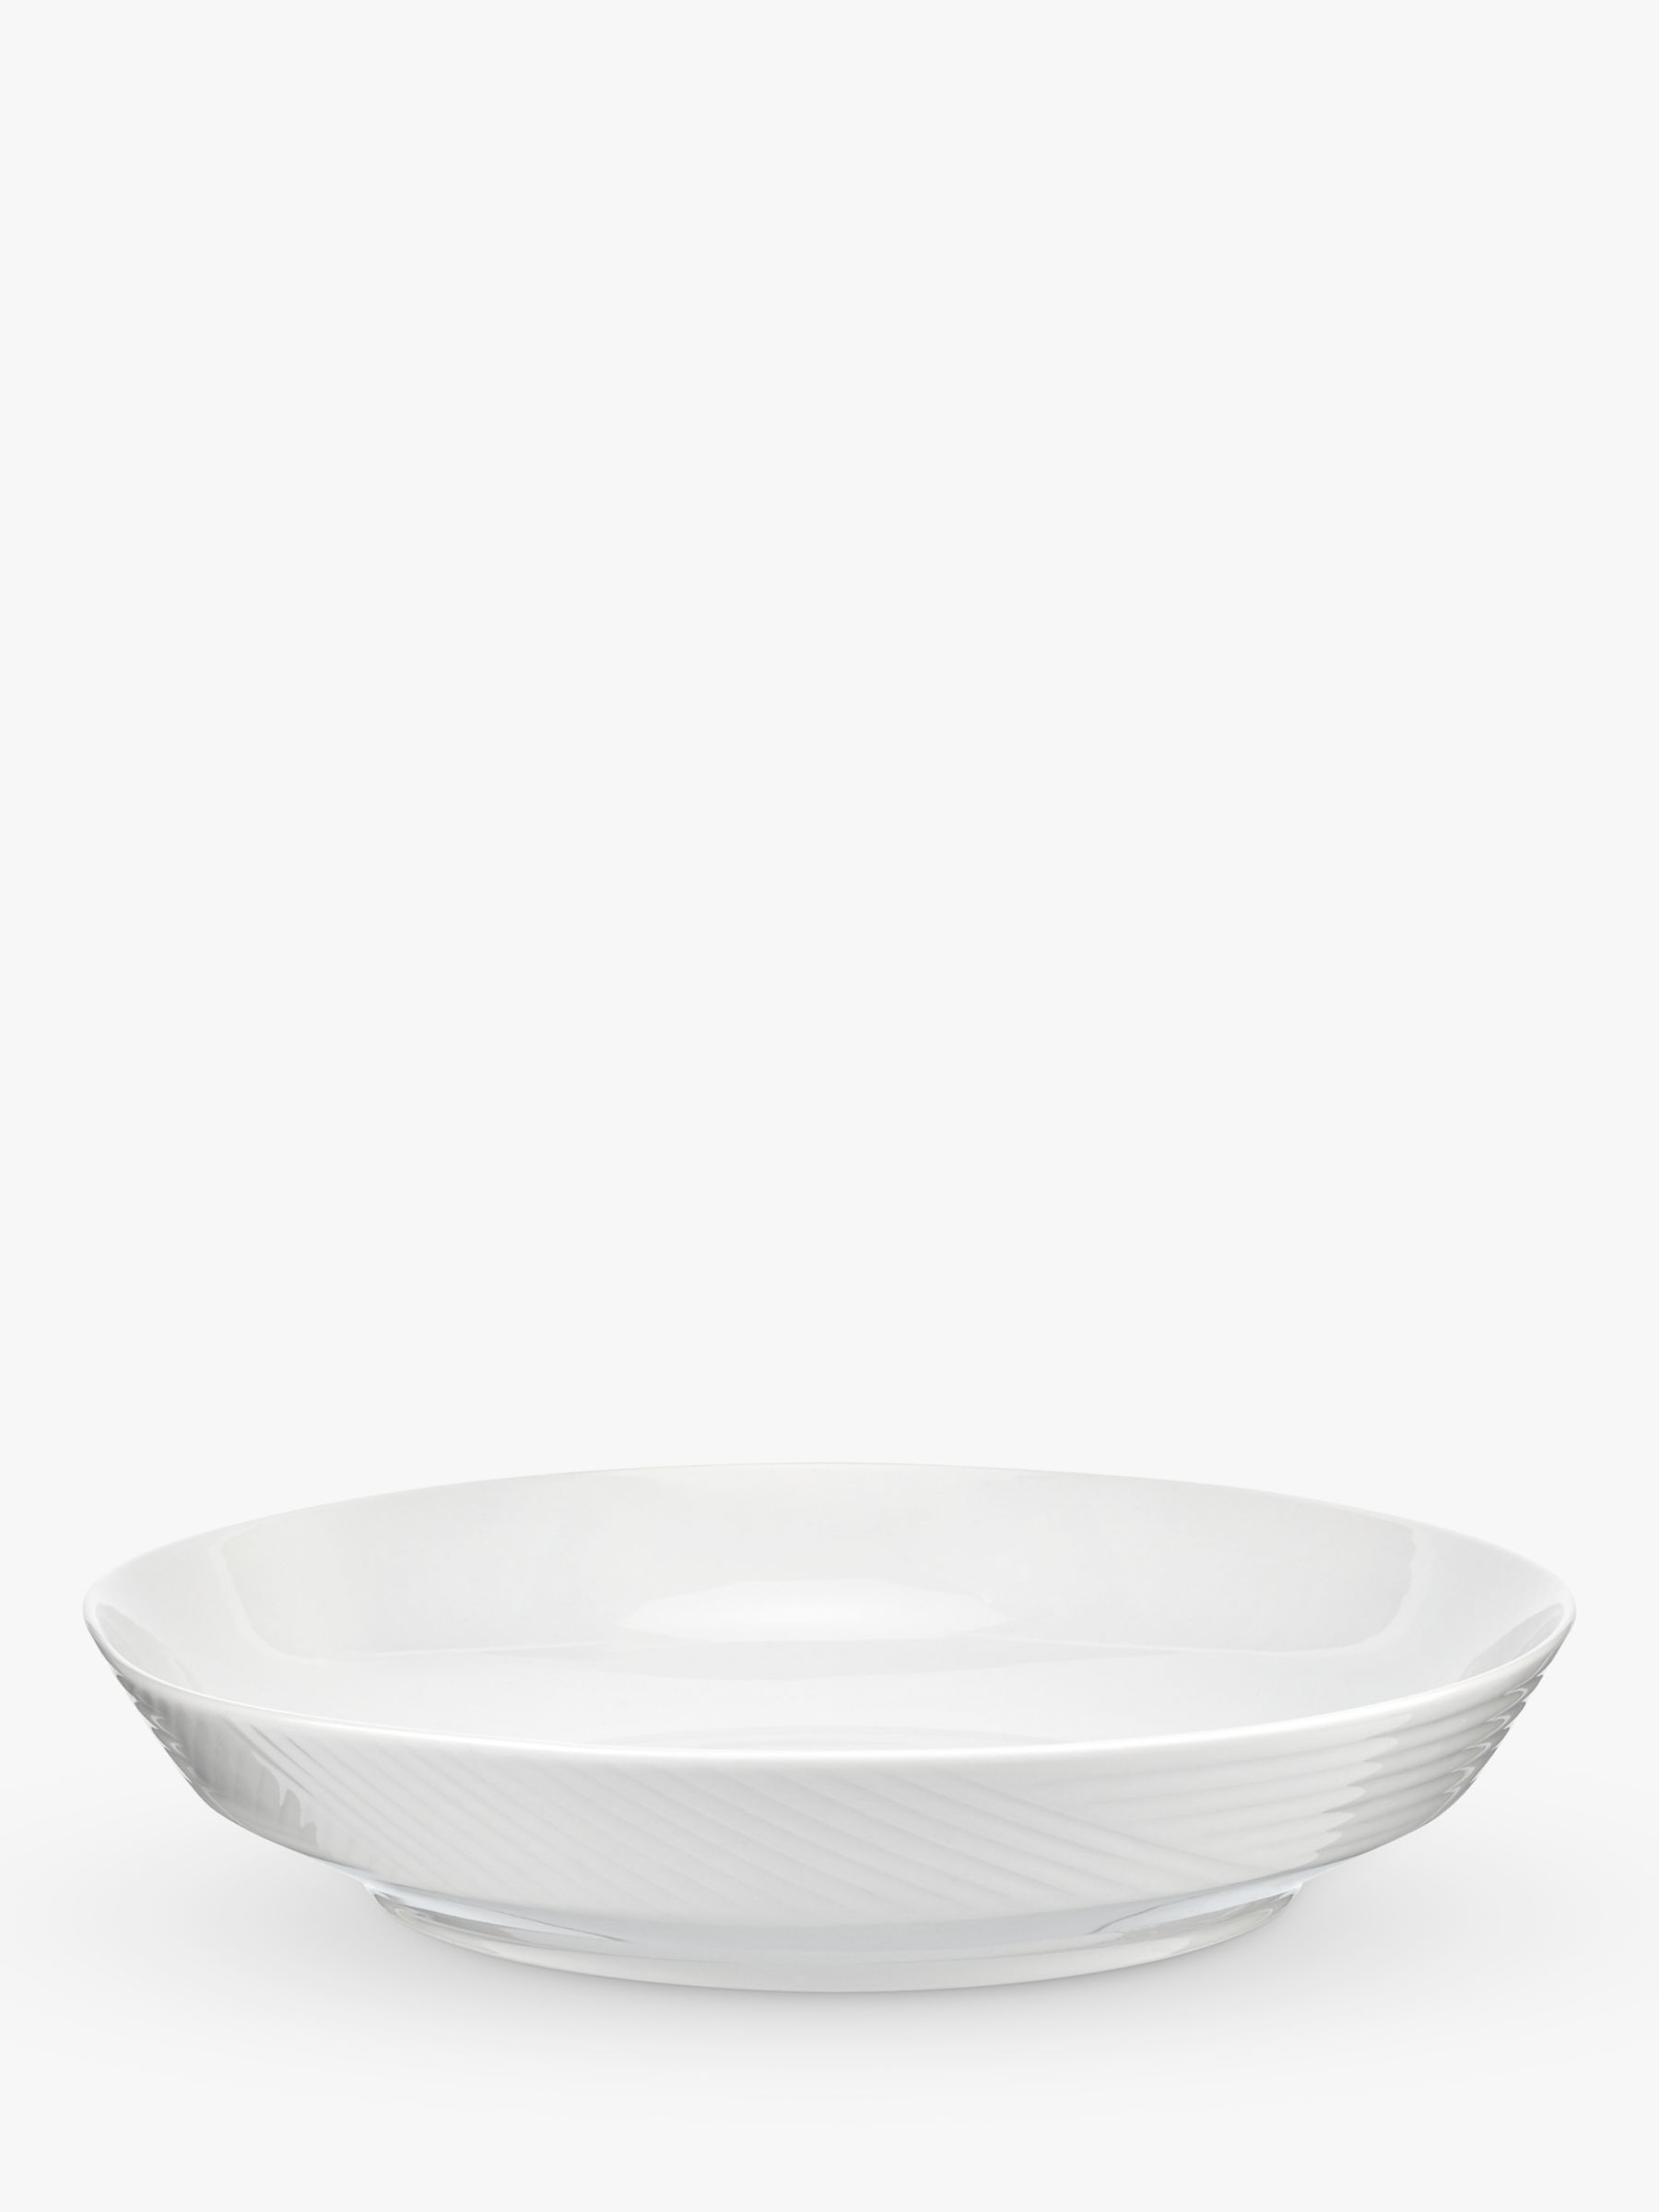 Design Project by John Lewis Design Project by John Lewis No.098 24cm Pasta Bowl